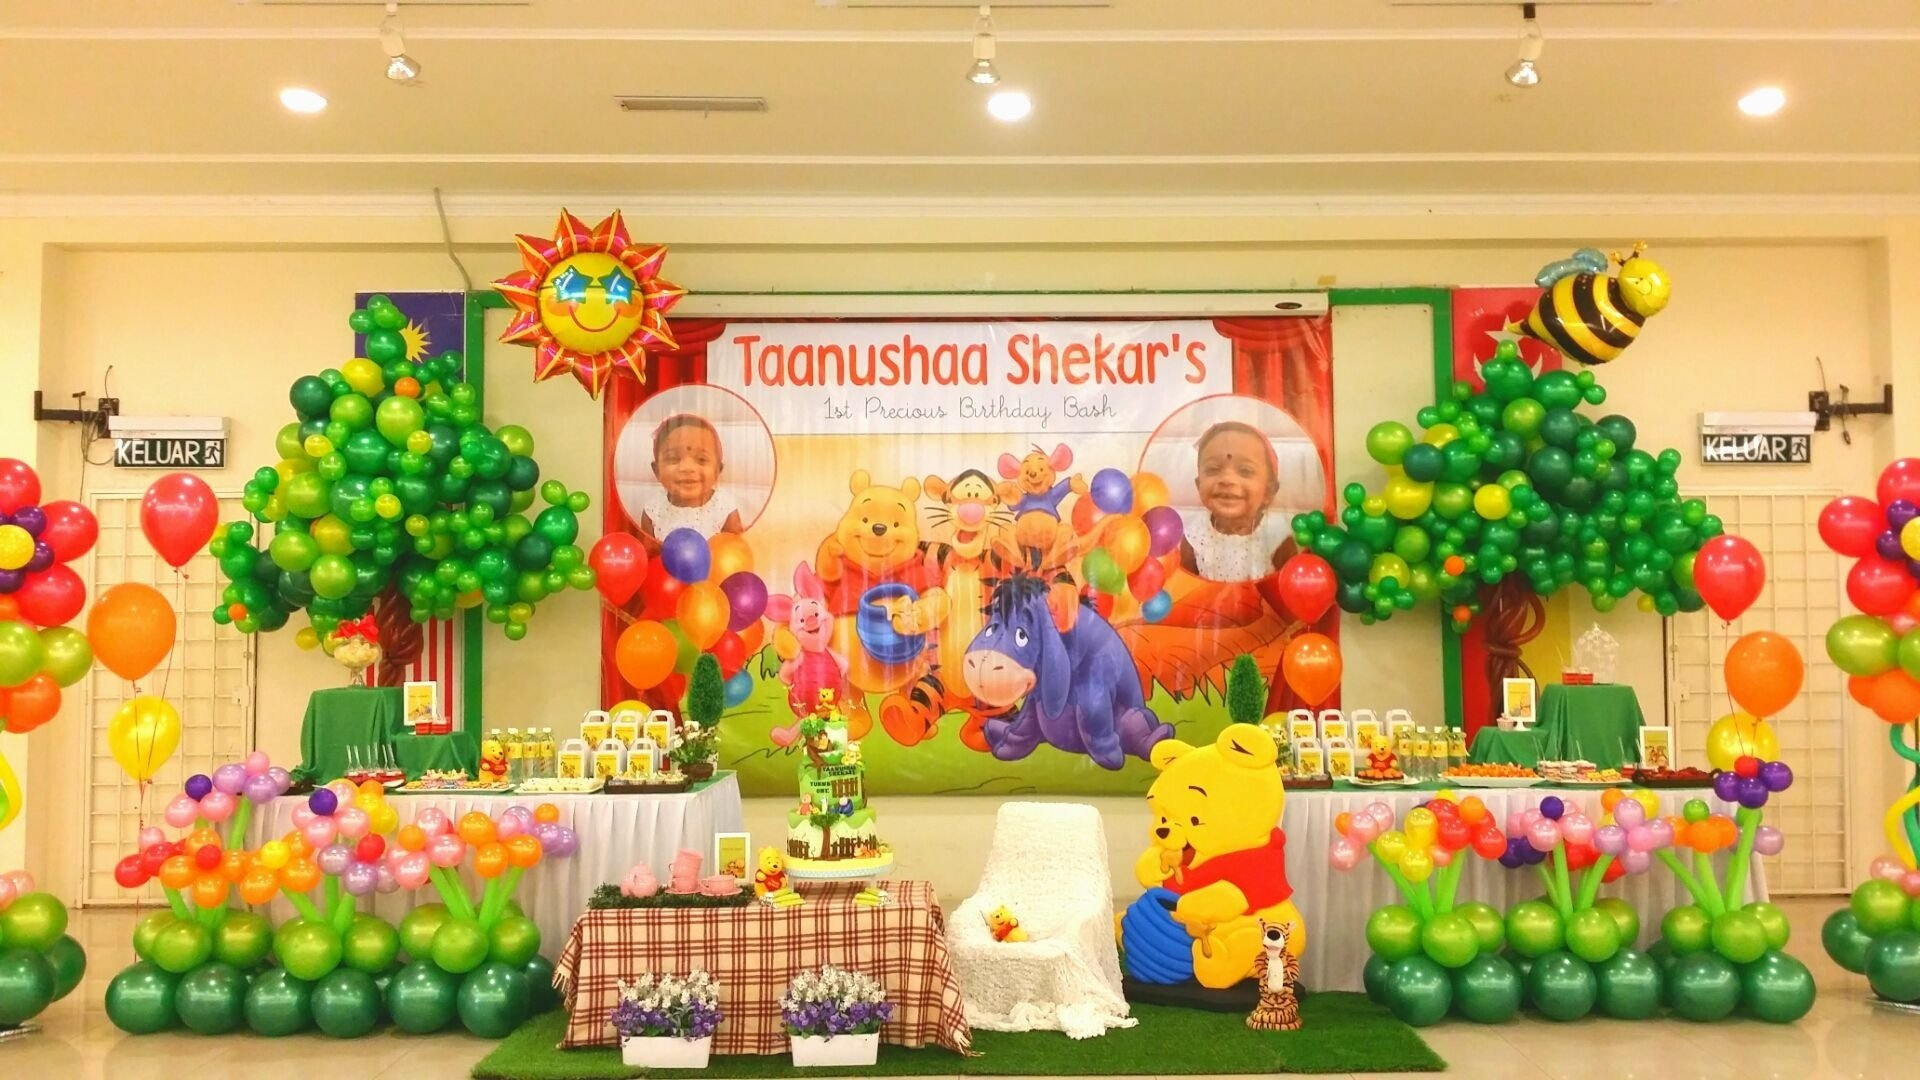 10 Stylish Winnie The Pooh Birthday Ideas winnie the pooh theme table centerpiece winnie the pooh birthday 2021